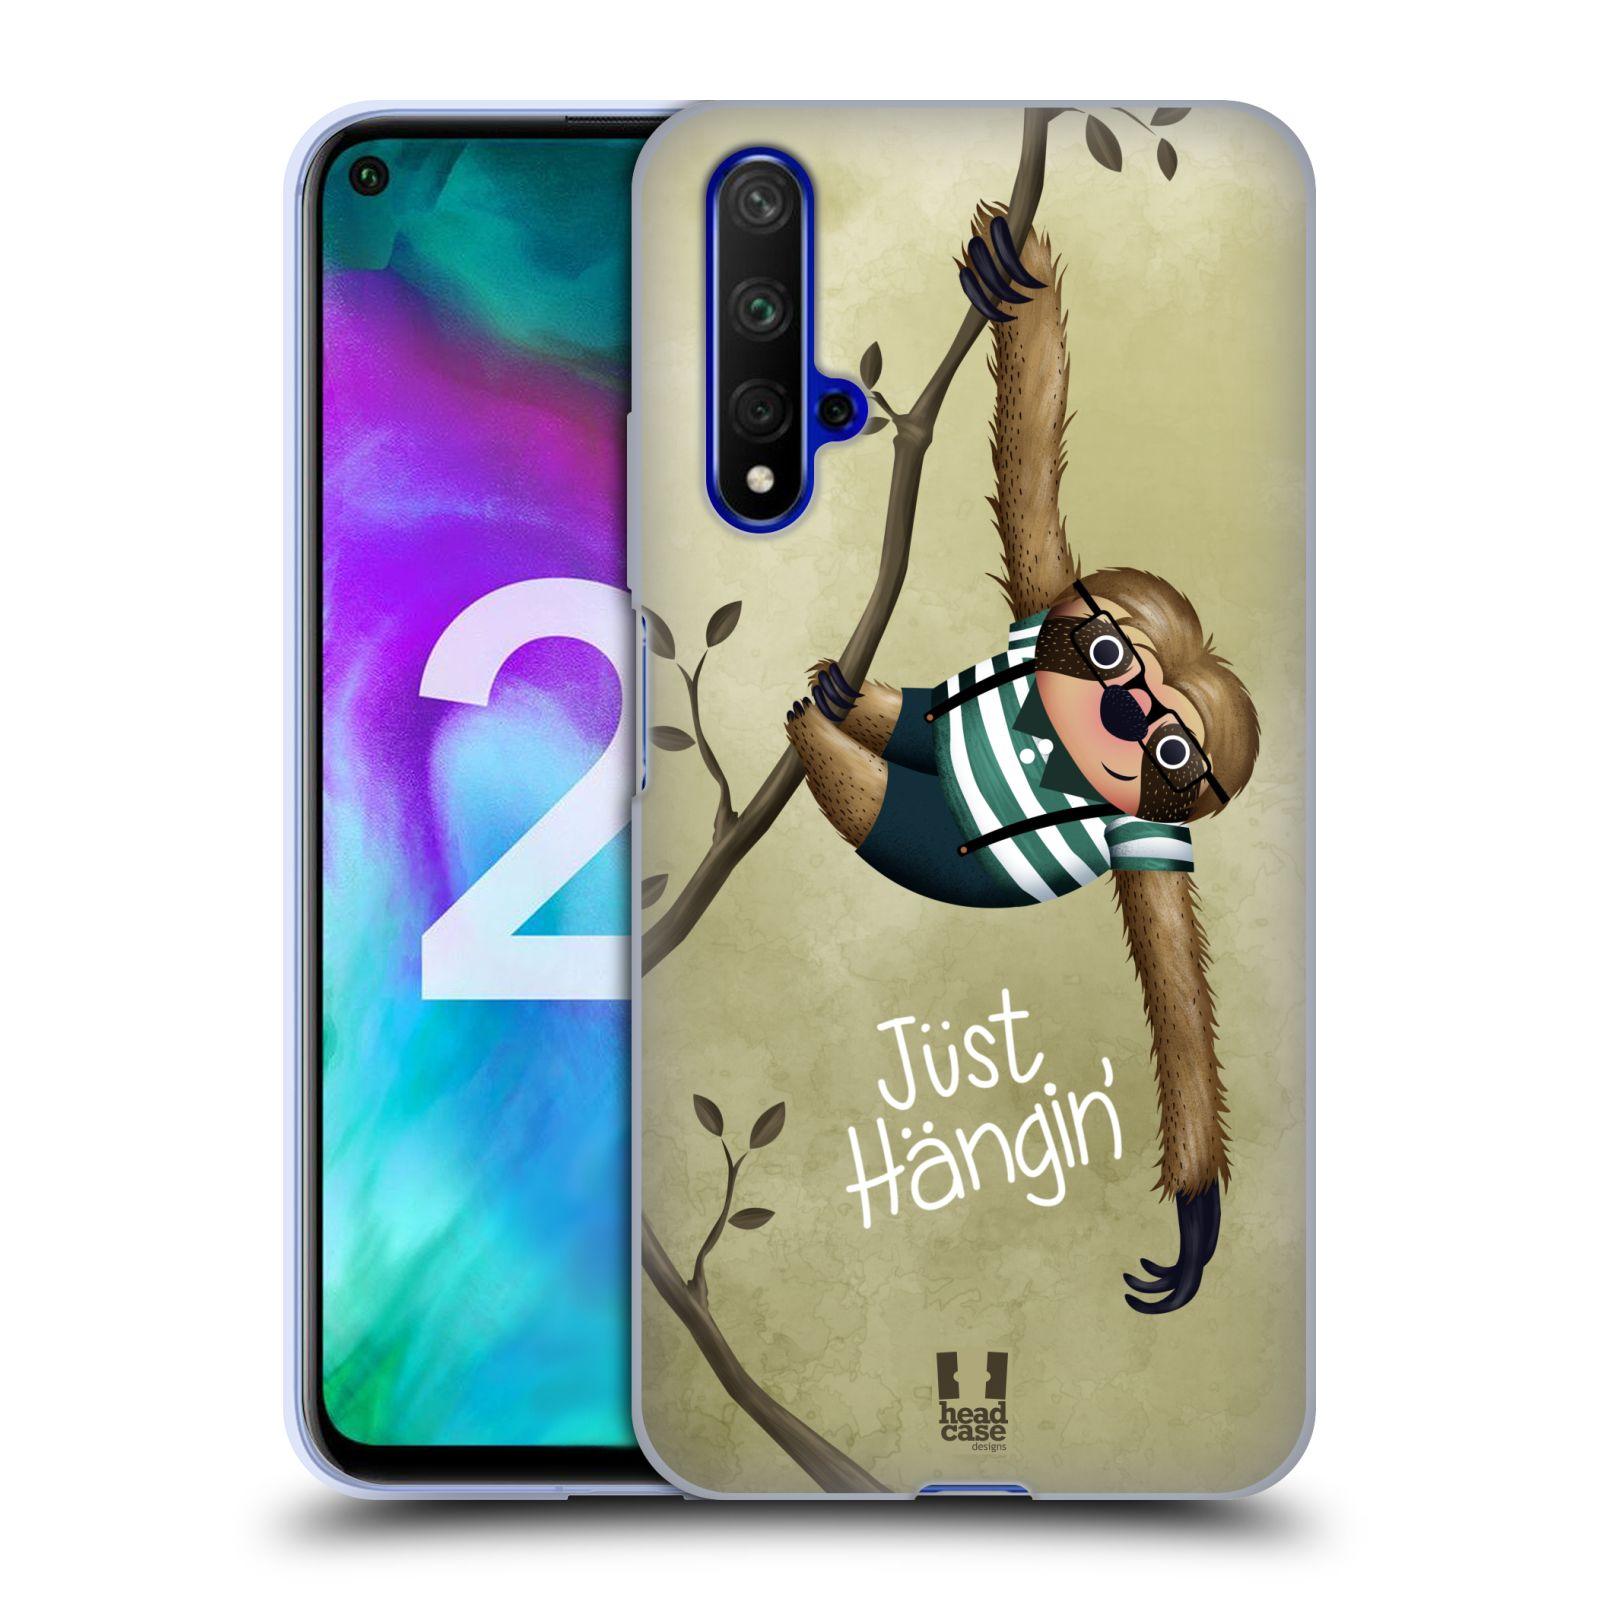 Silikonové pouzdro na mobil Honor 20 - Head Case - Lenochod Just Hangin